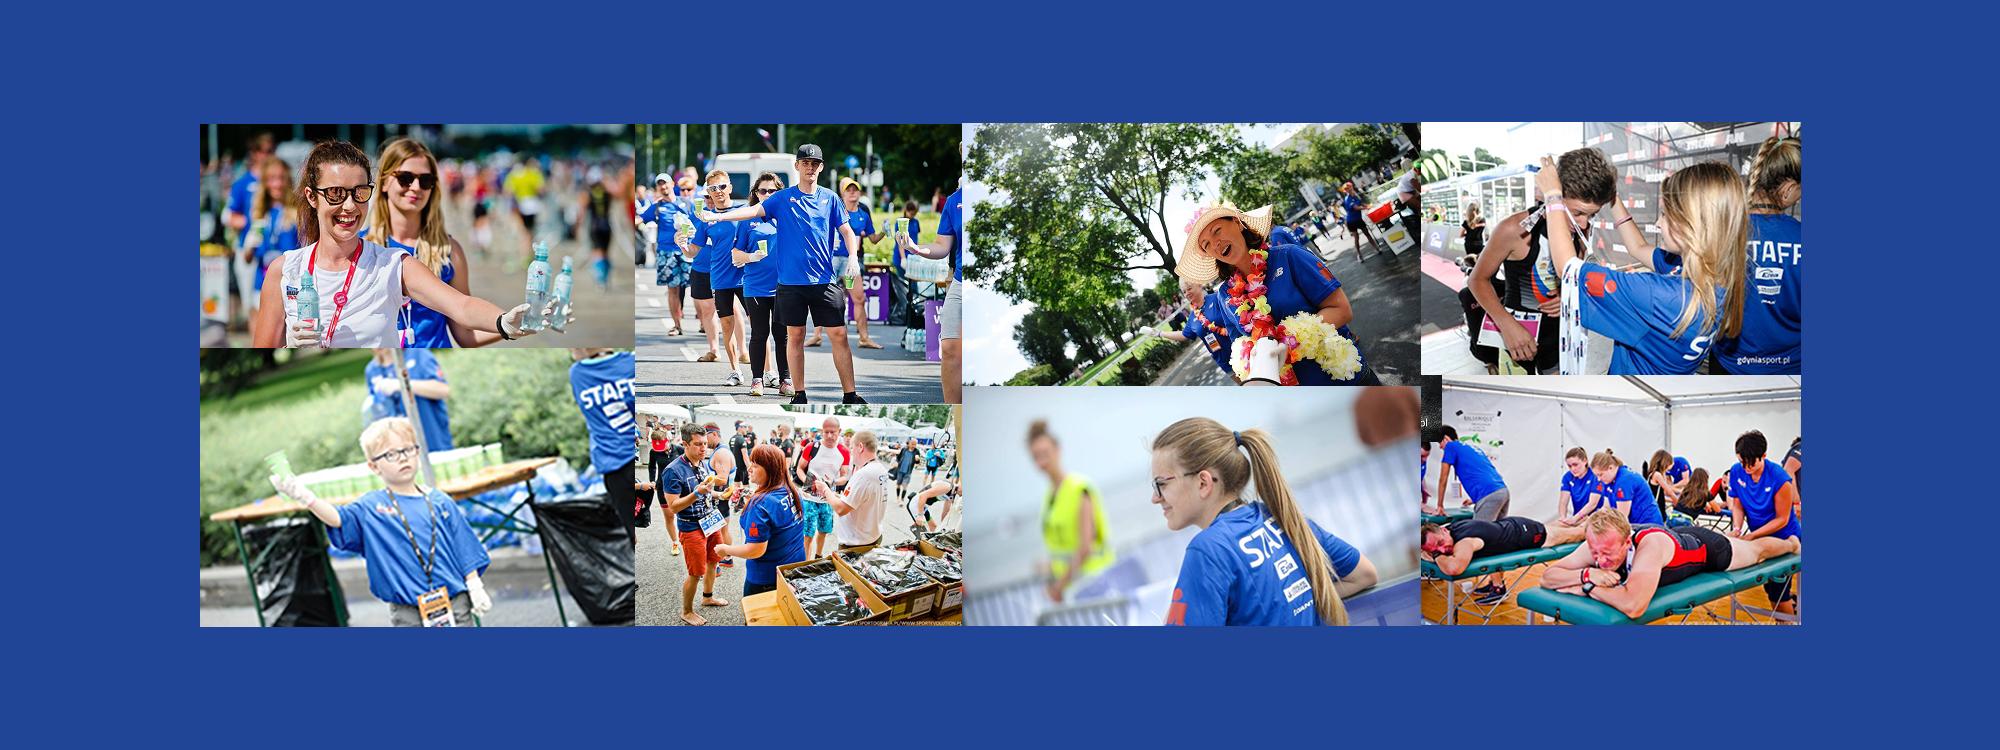 REJESTRACJA World Athletics Half Marathon Championships – Gdynia 2020 JUŻ RUSZYŁA!